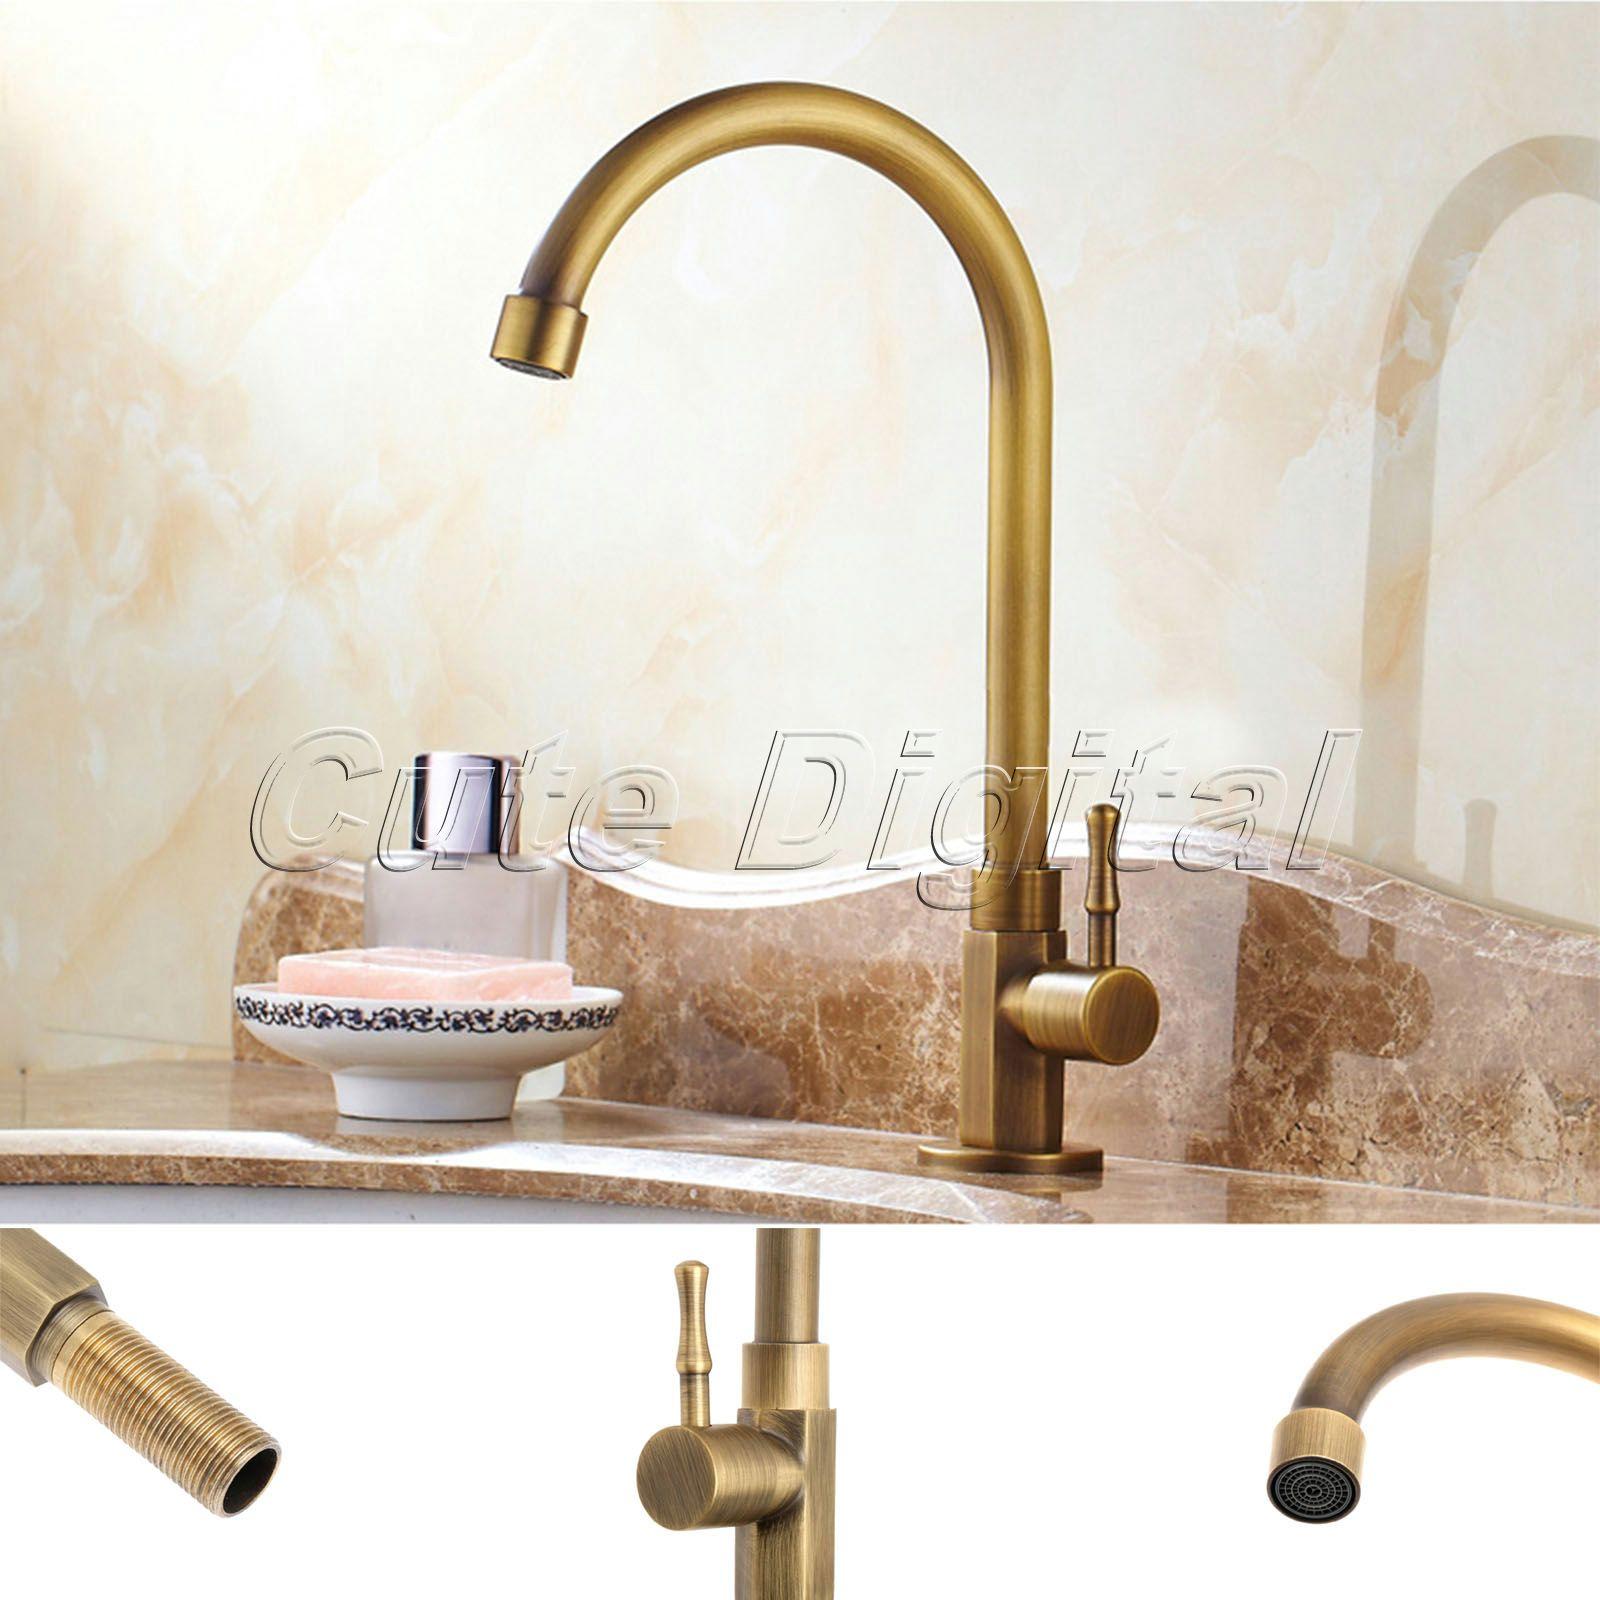 Antique Brass Luxury Bathroom Sink Faucet Single Handle Swivel Spout Kitchen Faucets Vessel Sink Mixer Water